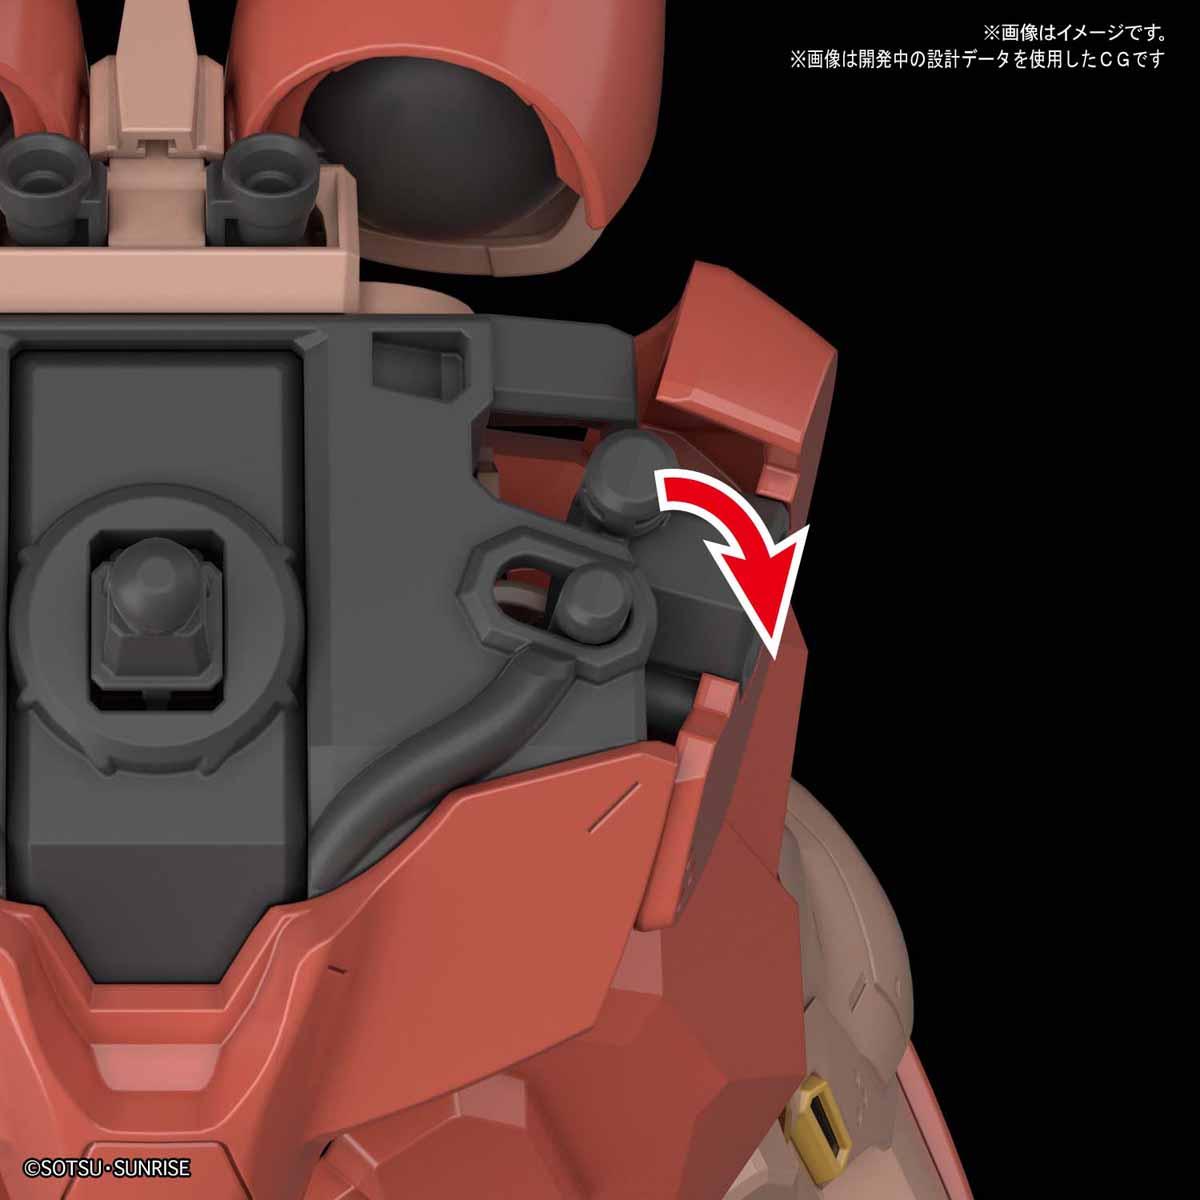 HGUC 1/144『メッサー(仮)』機動戦士ガンダム 閃光のハサウェイ プラモデル-004